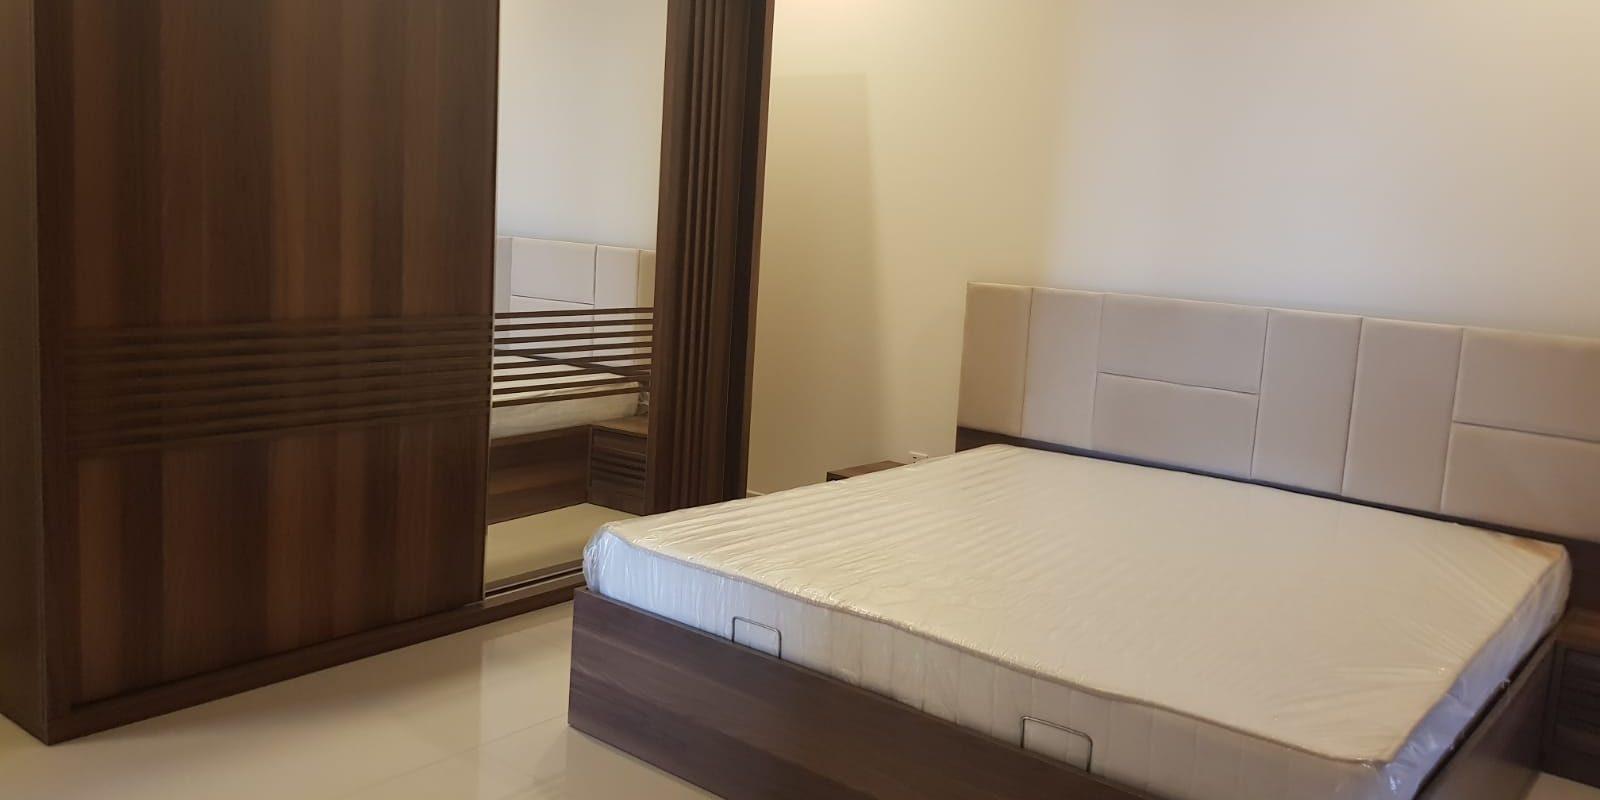 Impressive 2 Bedroom Apartment in Busaiteen!